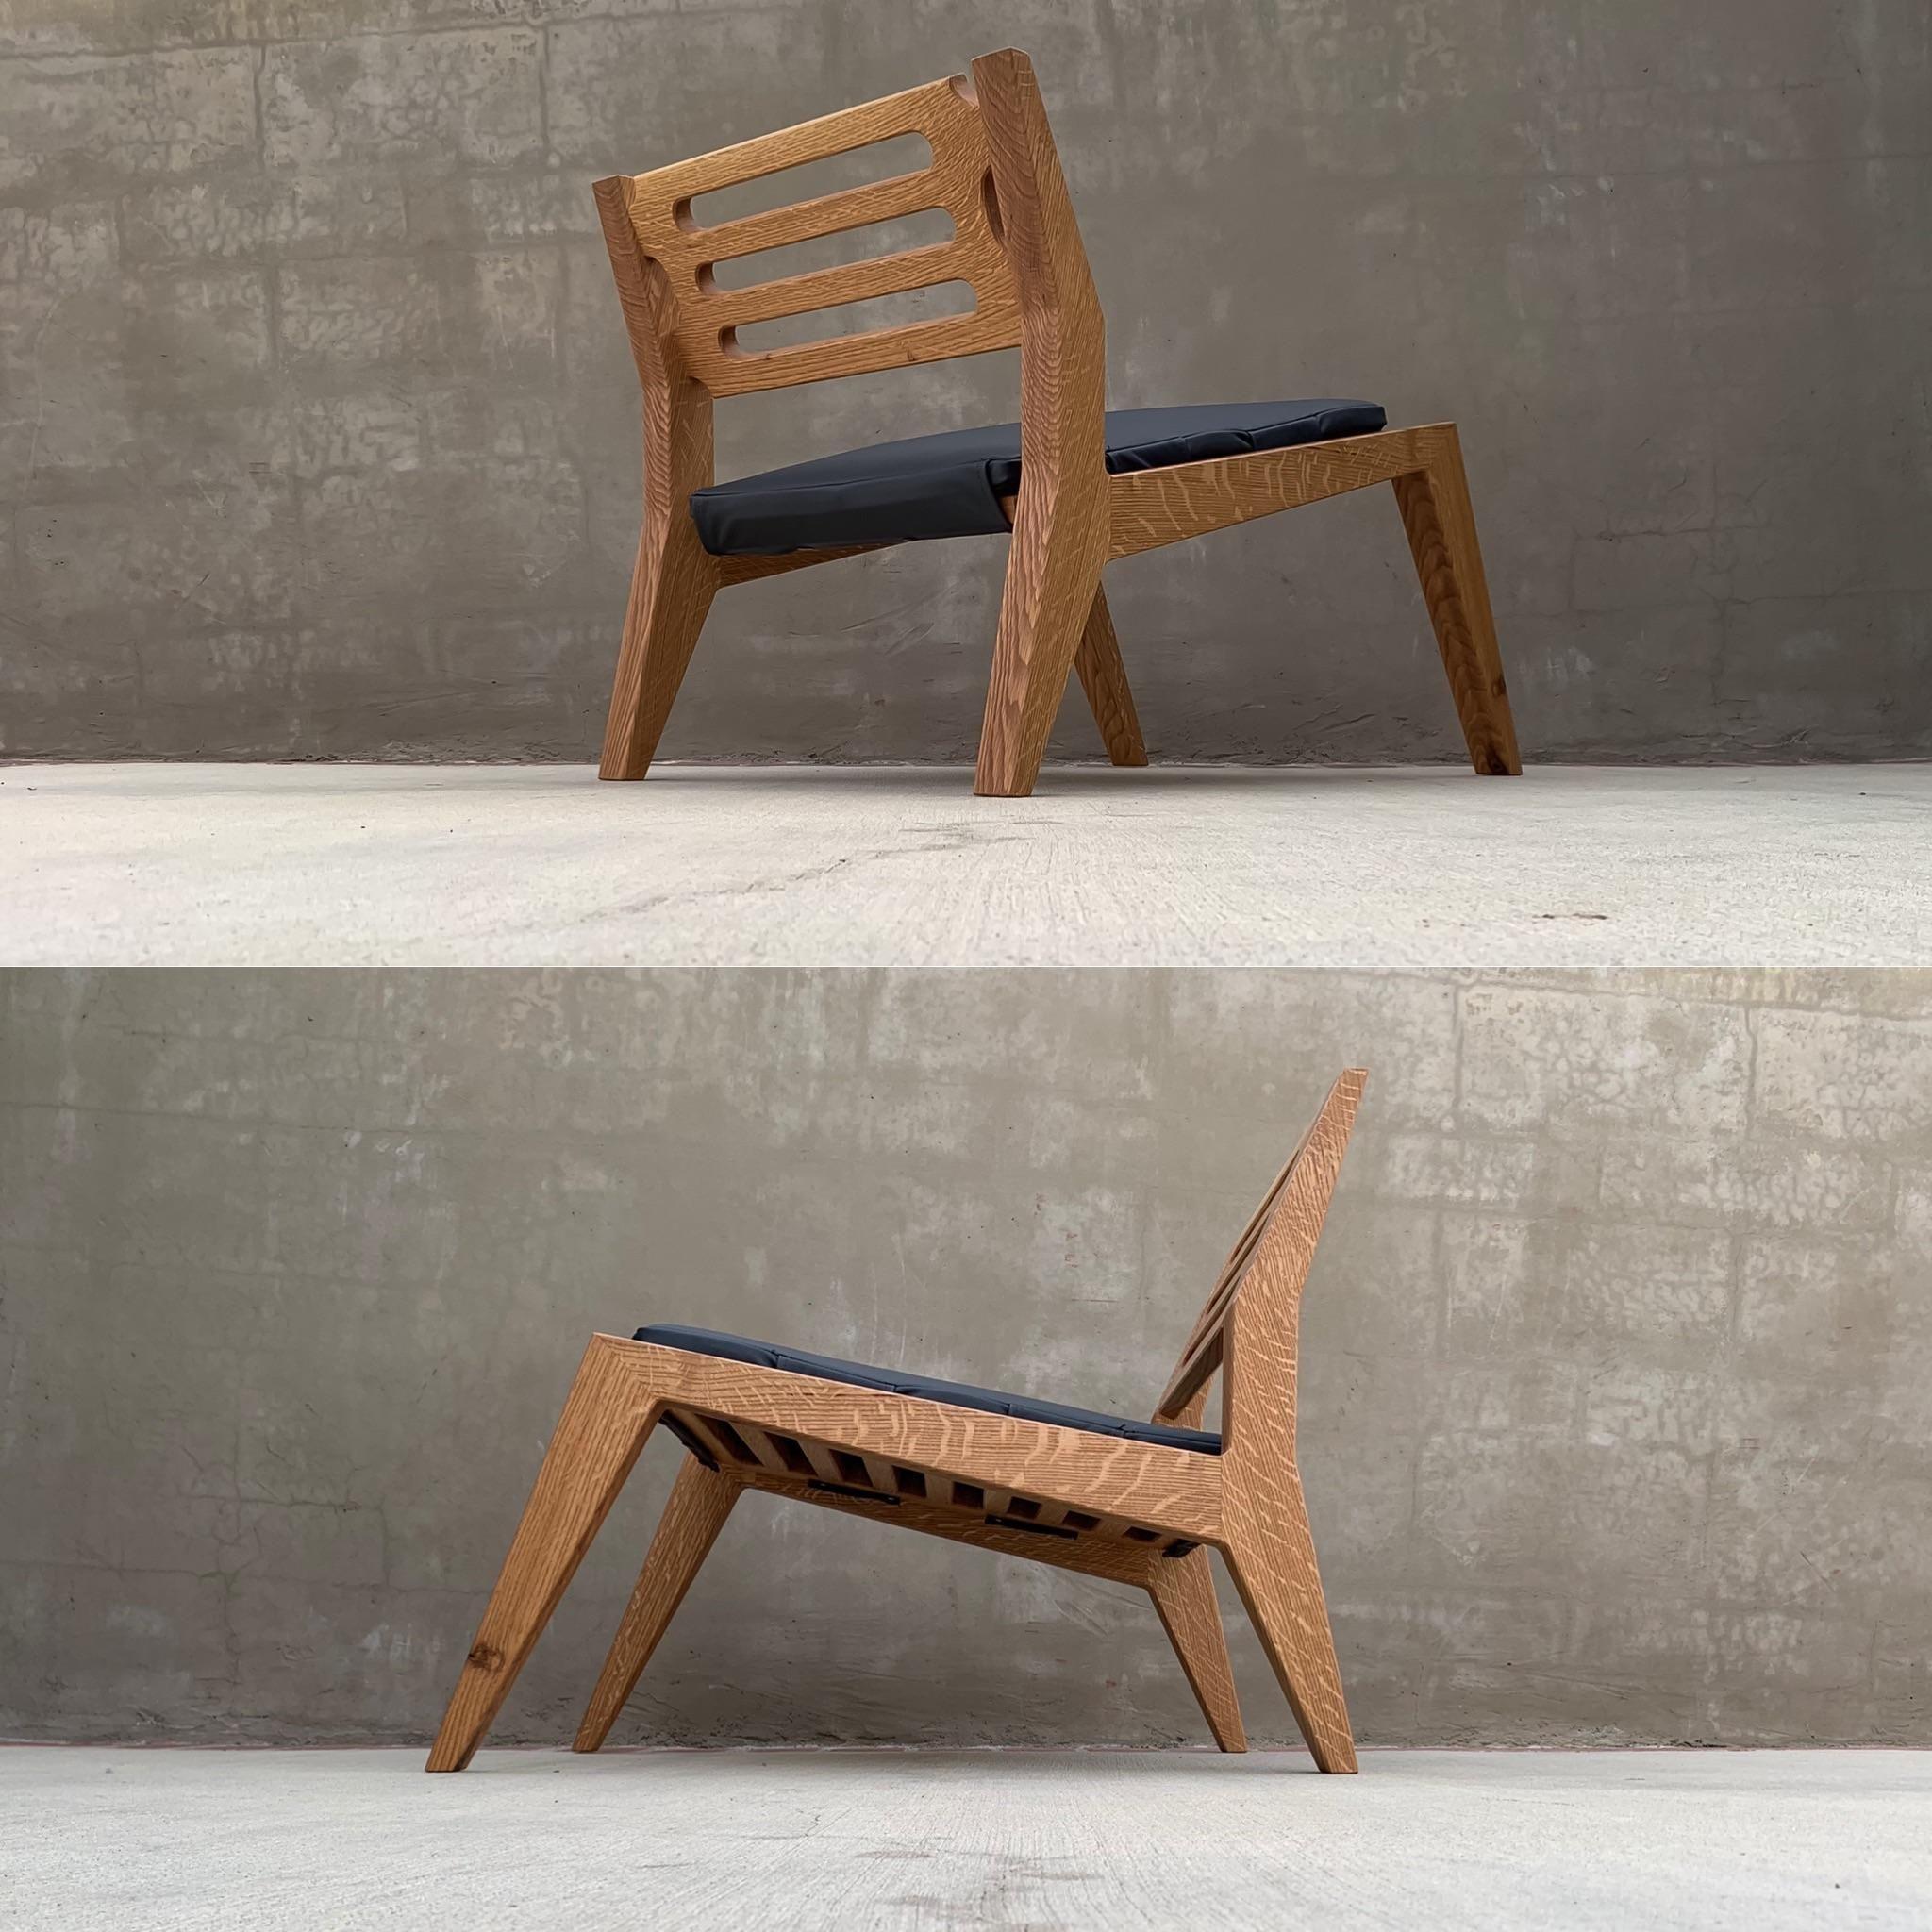 White Oak Accent Chair Woodworking Chair Woodworking Plans Woodworking Plans Wood Projects Woodworking Plans Sofa